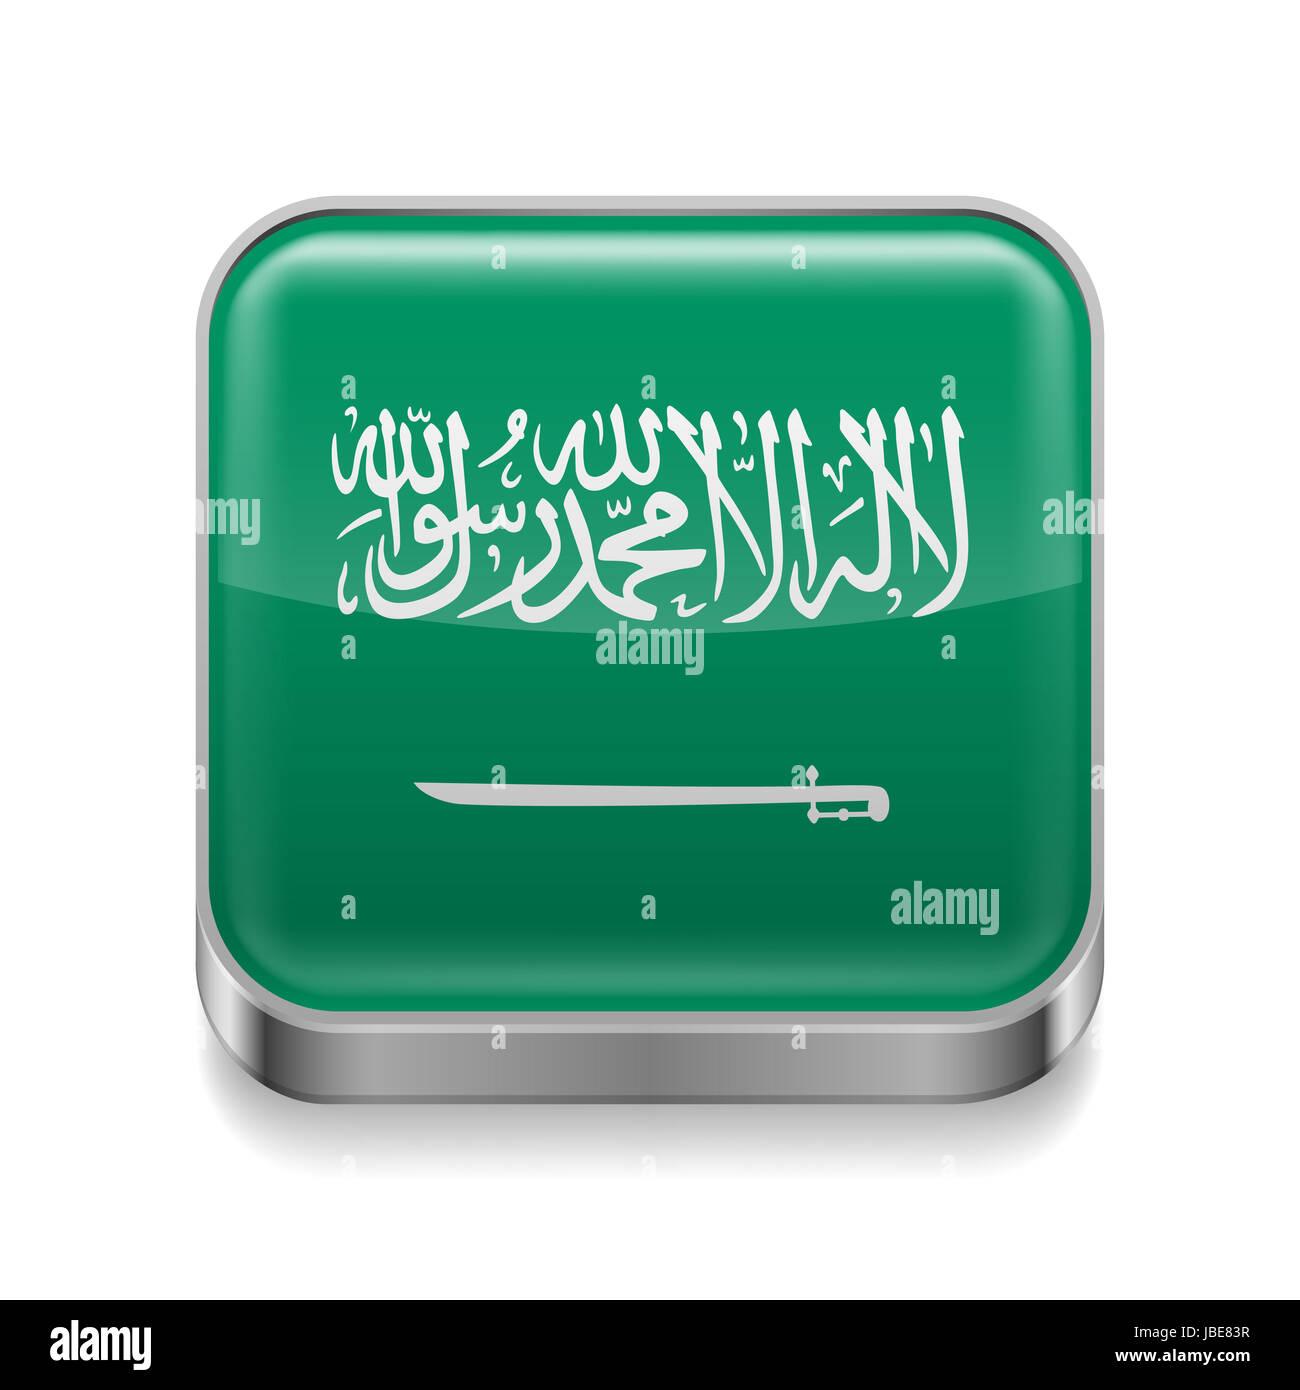 Metal square icon with flag colors of Saudi Arabia - Stock Image